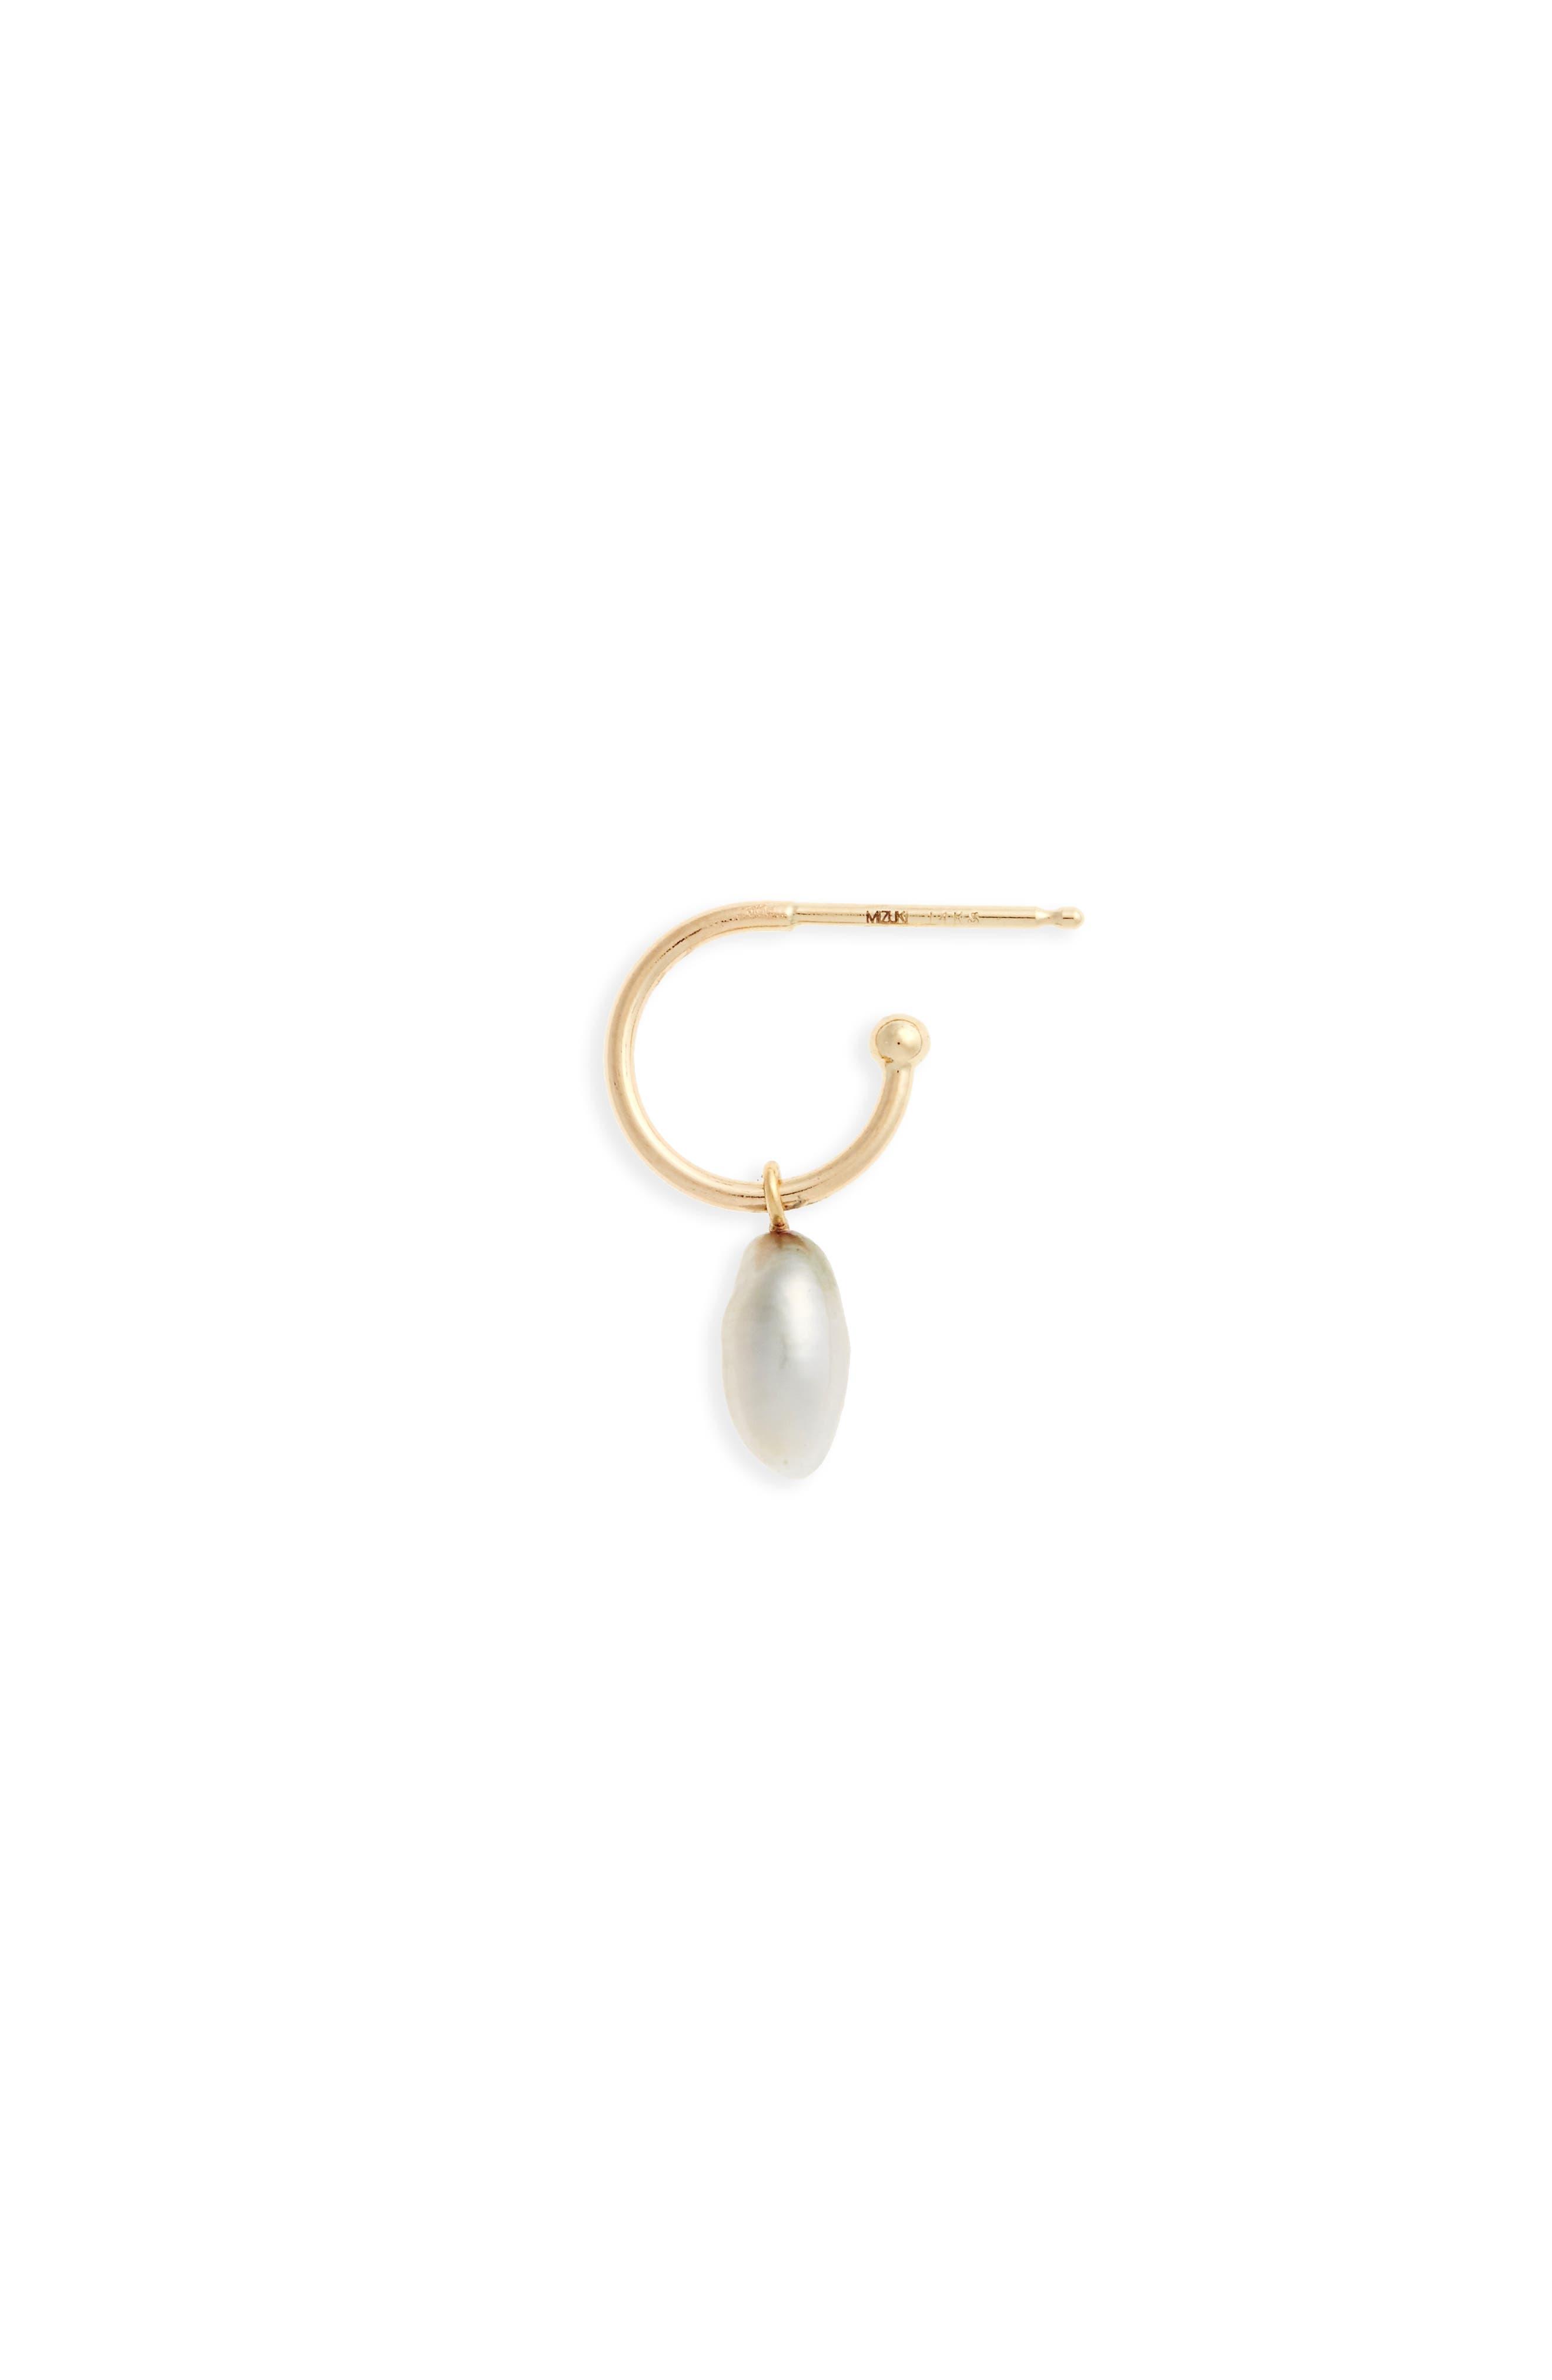 Sea of Beauty Pearl Single Hoop Earring,                         Main,                         color, Yellow Gold/ Grey Pearl